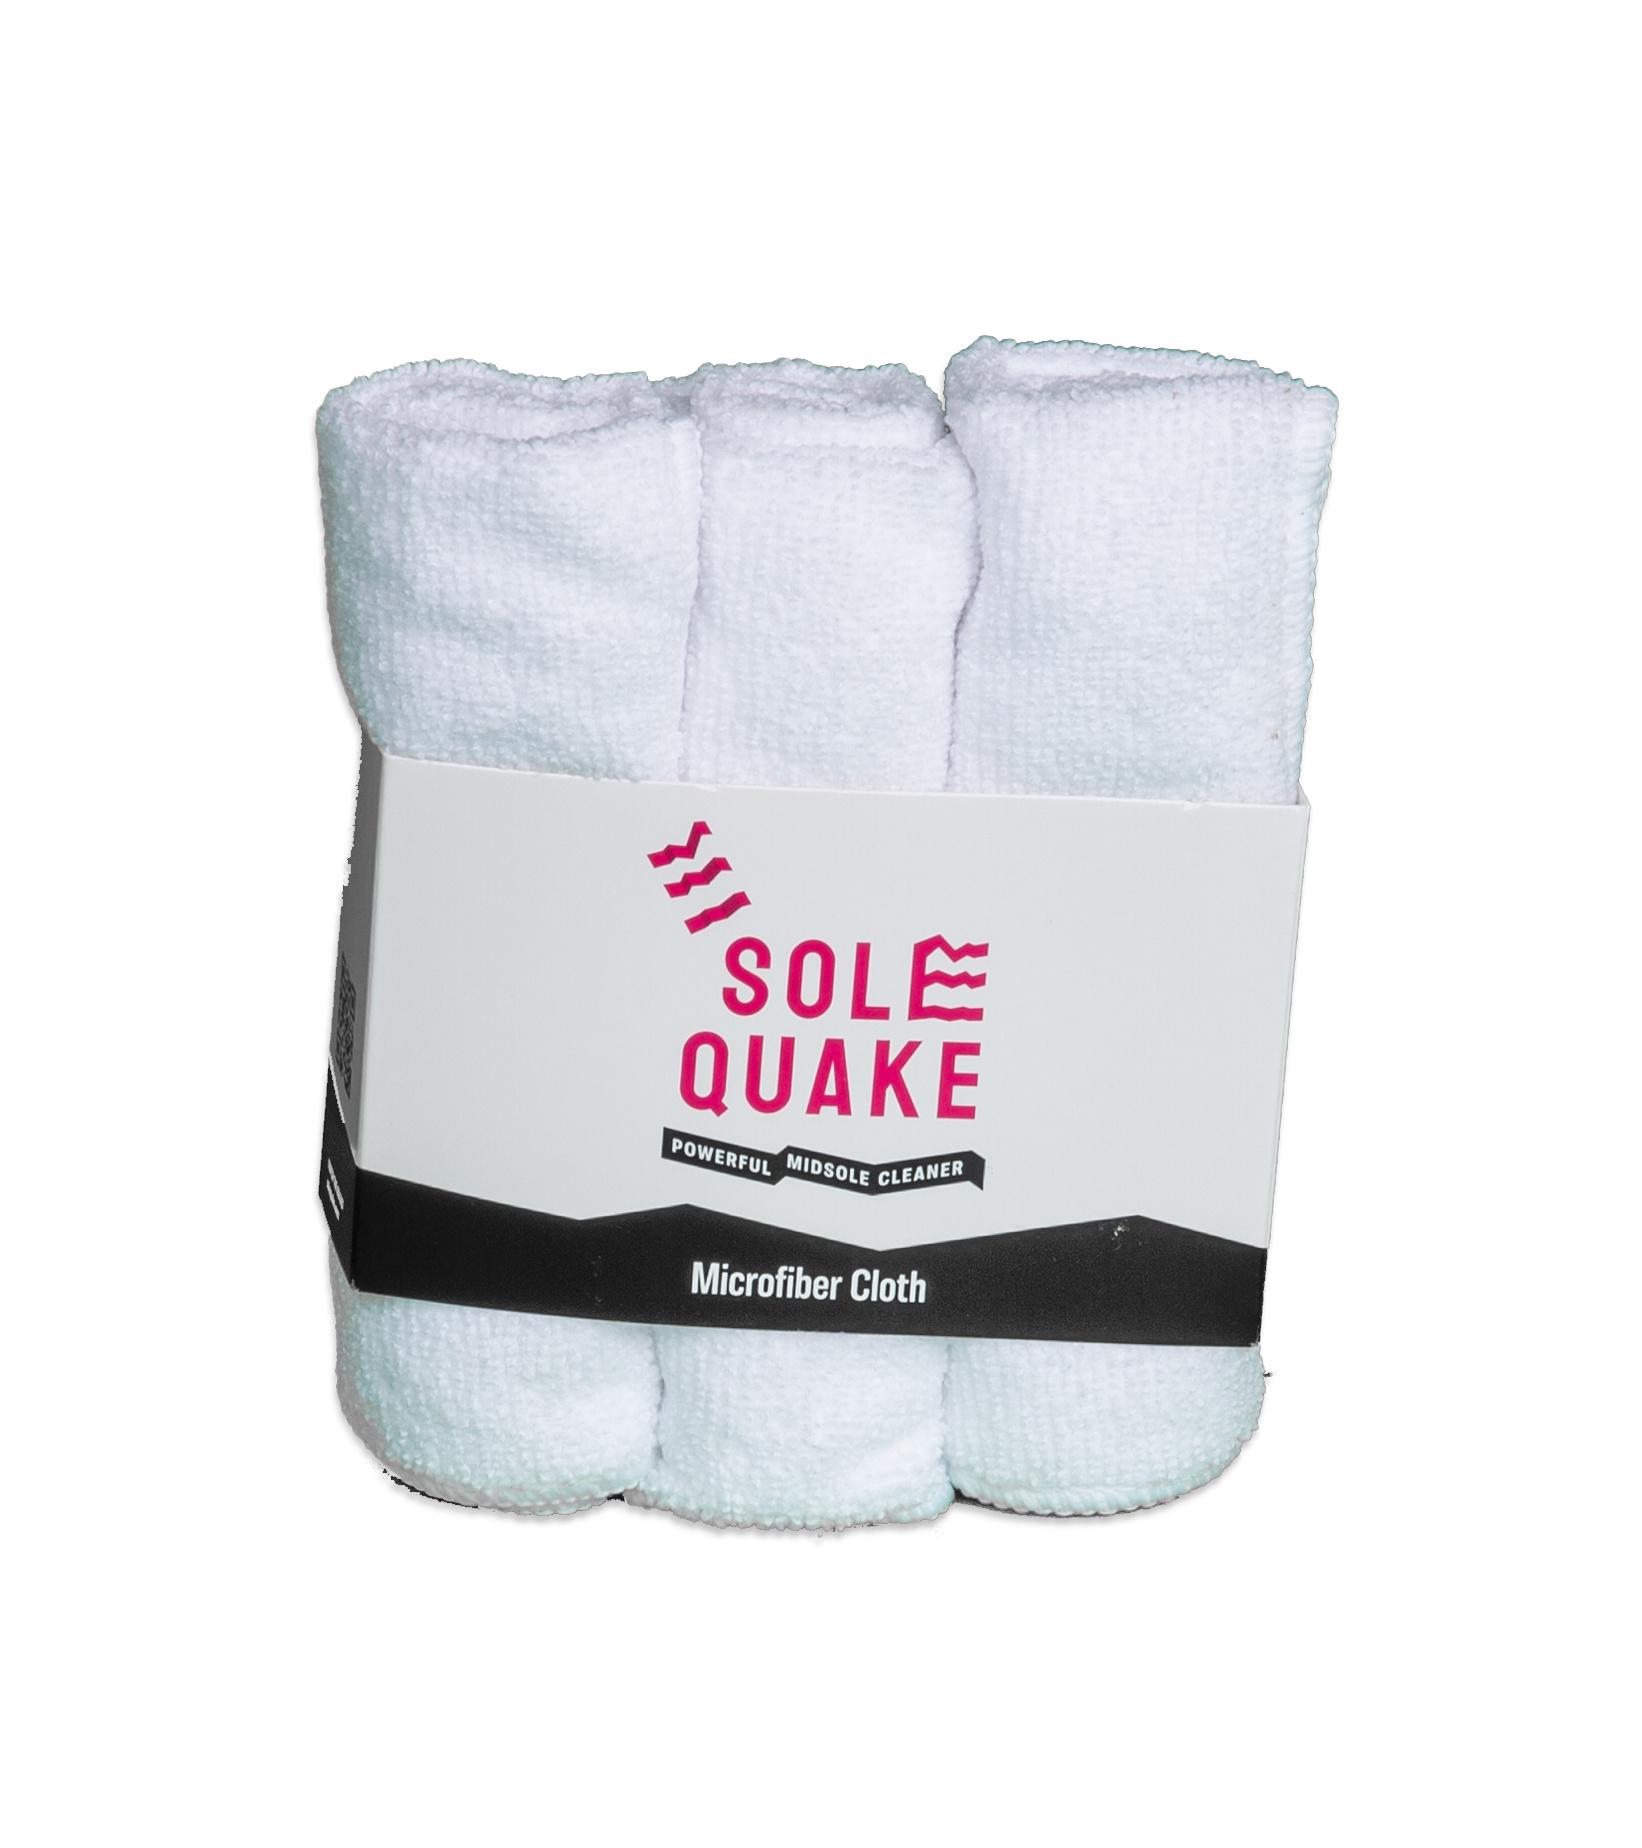 Solequake Microfiber Cloth 3psc-1